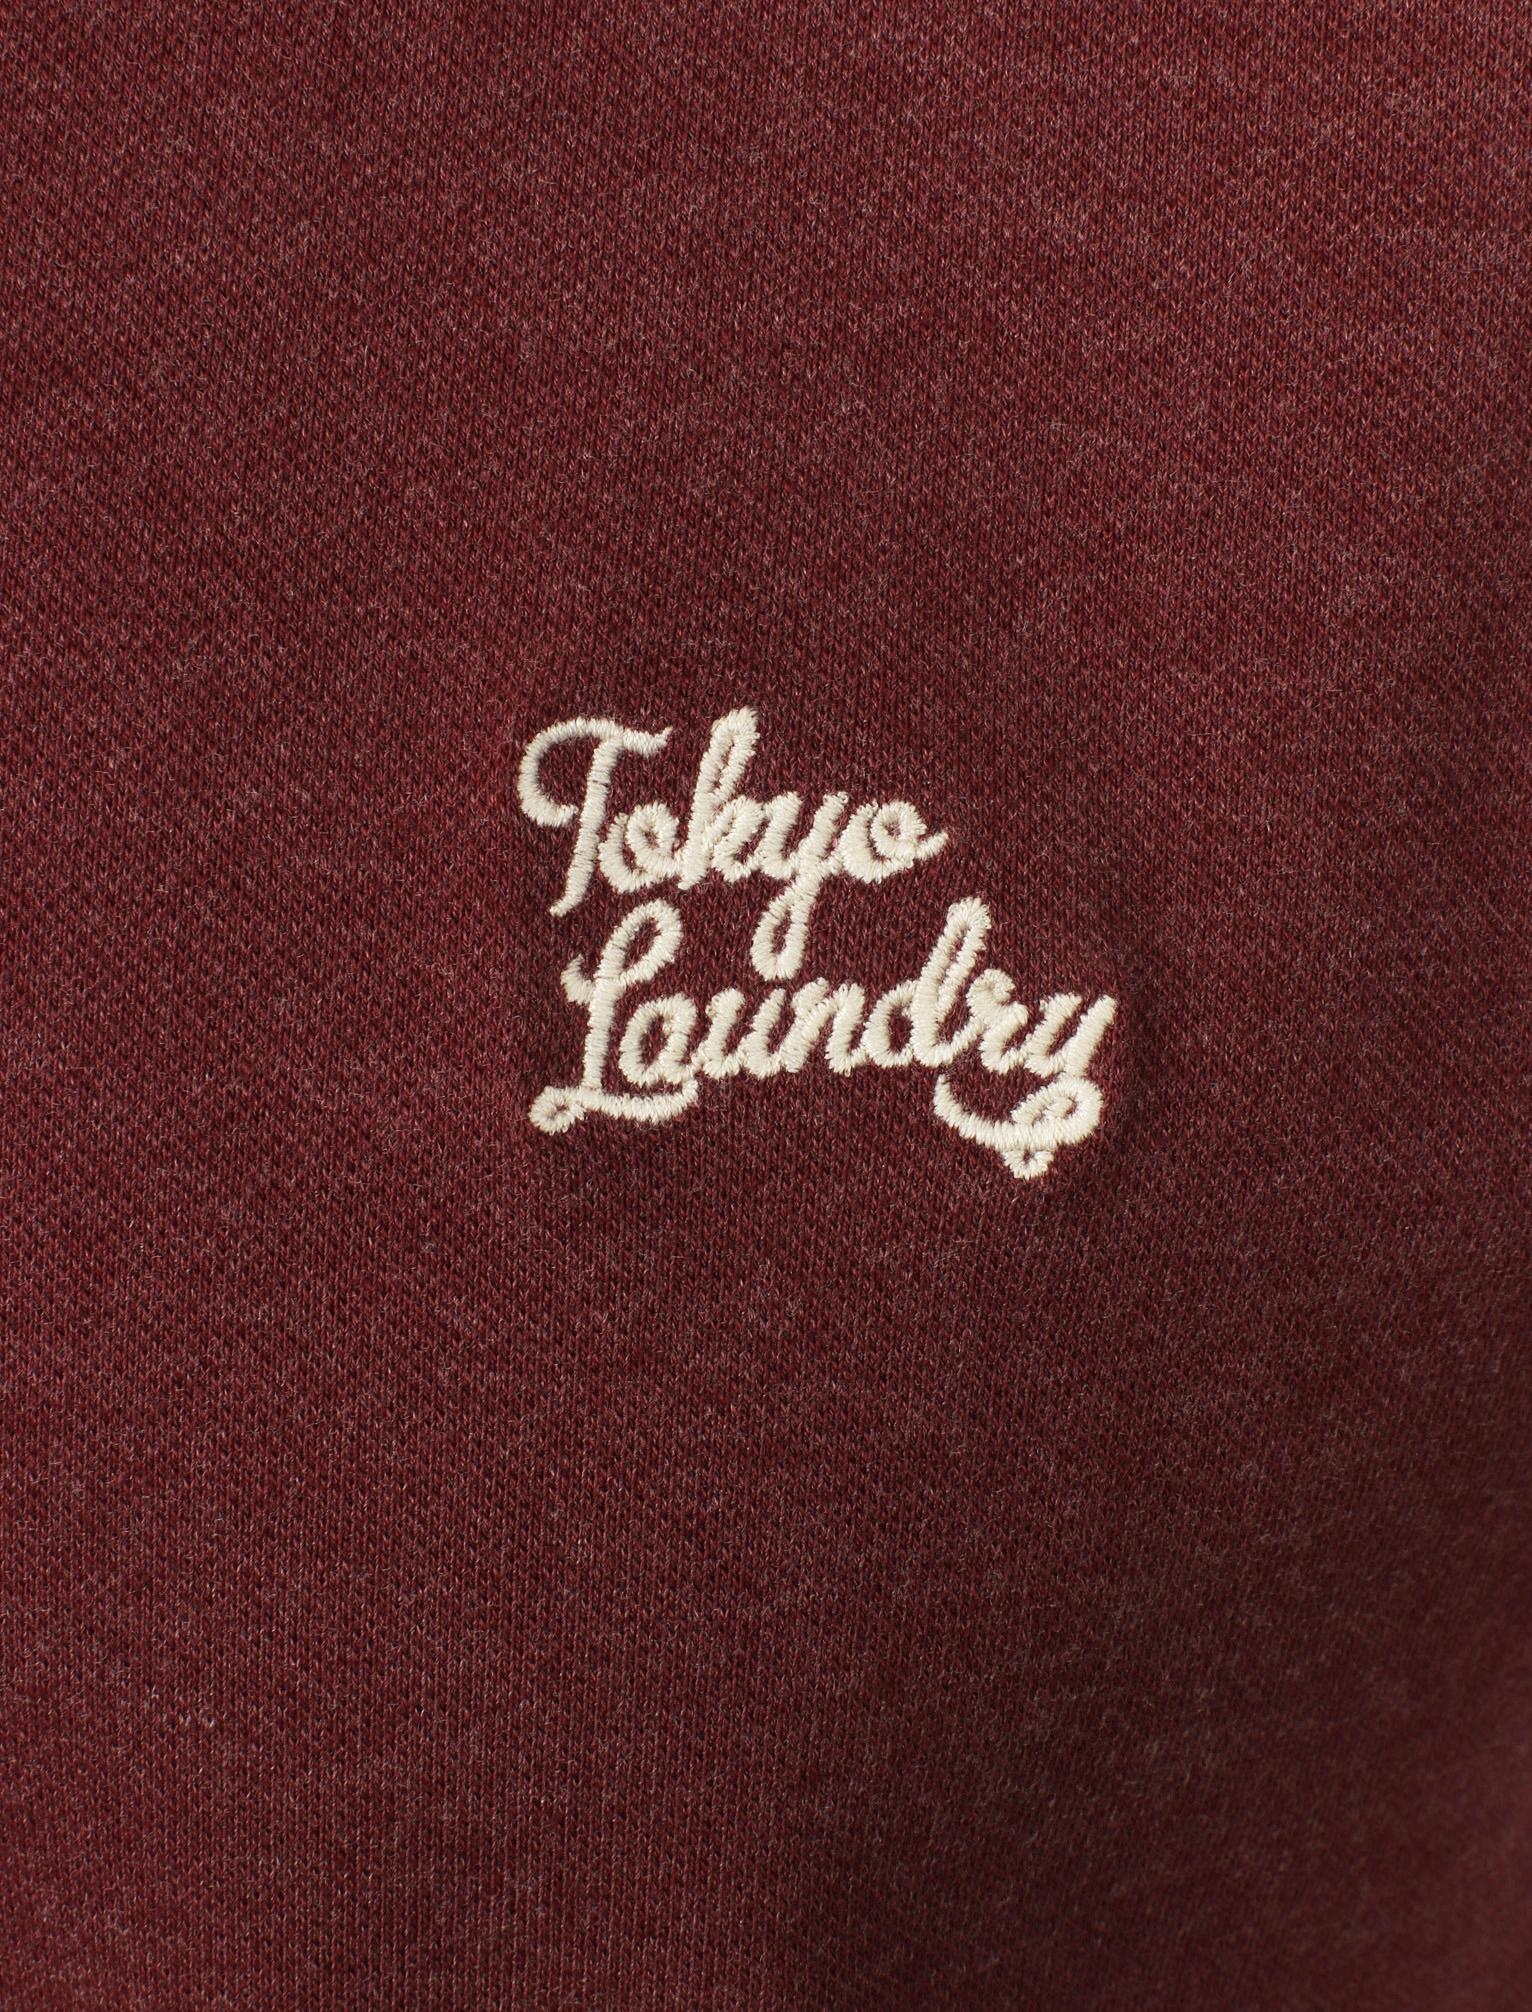 New-Mens-Tokyo-Laundry-Branded-Kuusamo-Cotton-Rich-Pique-Polo-Shirt-Size-S-XXL thumbnail 24